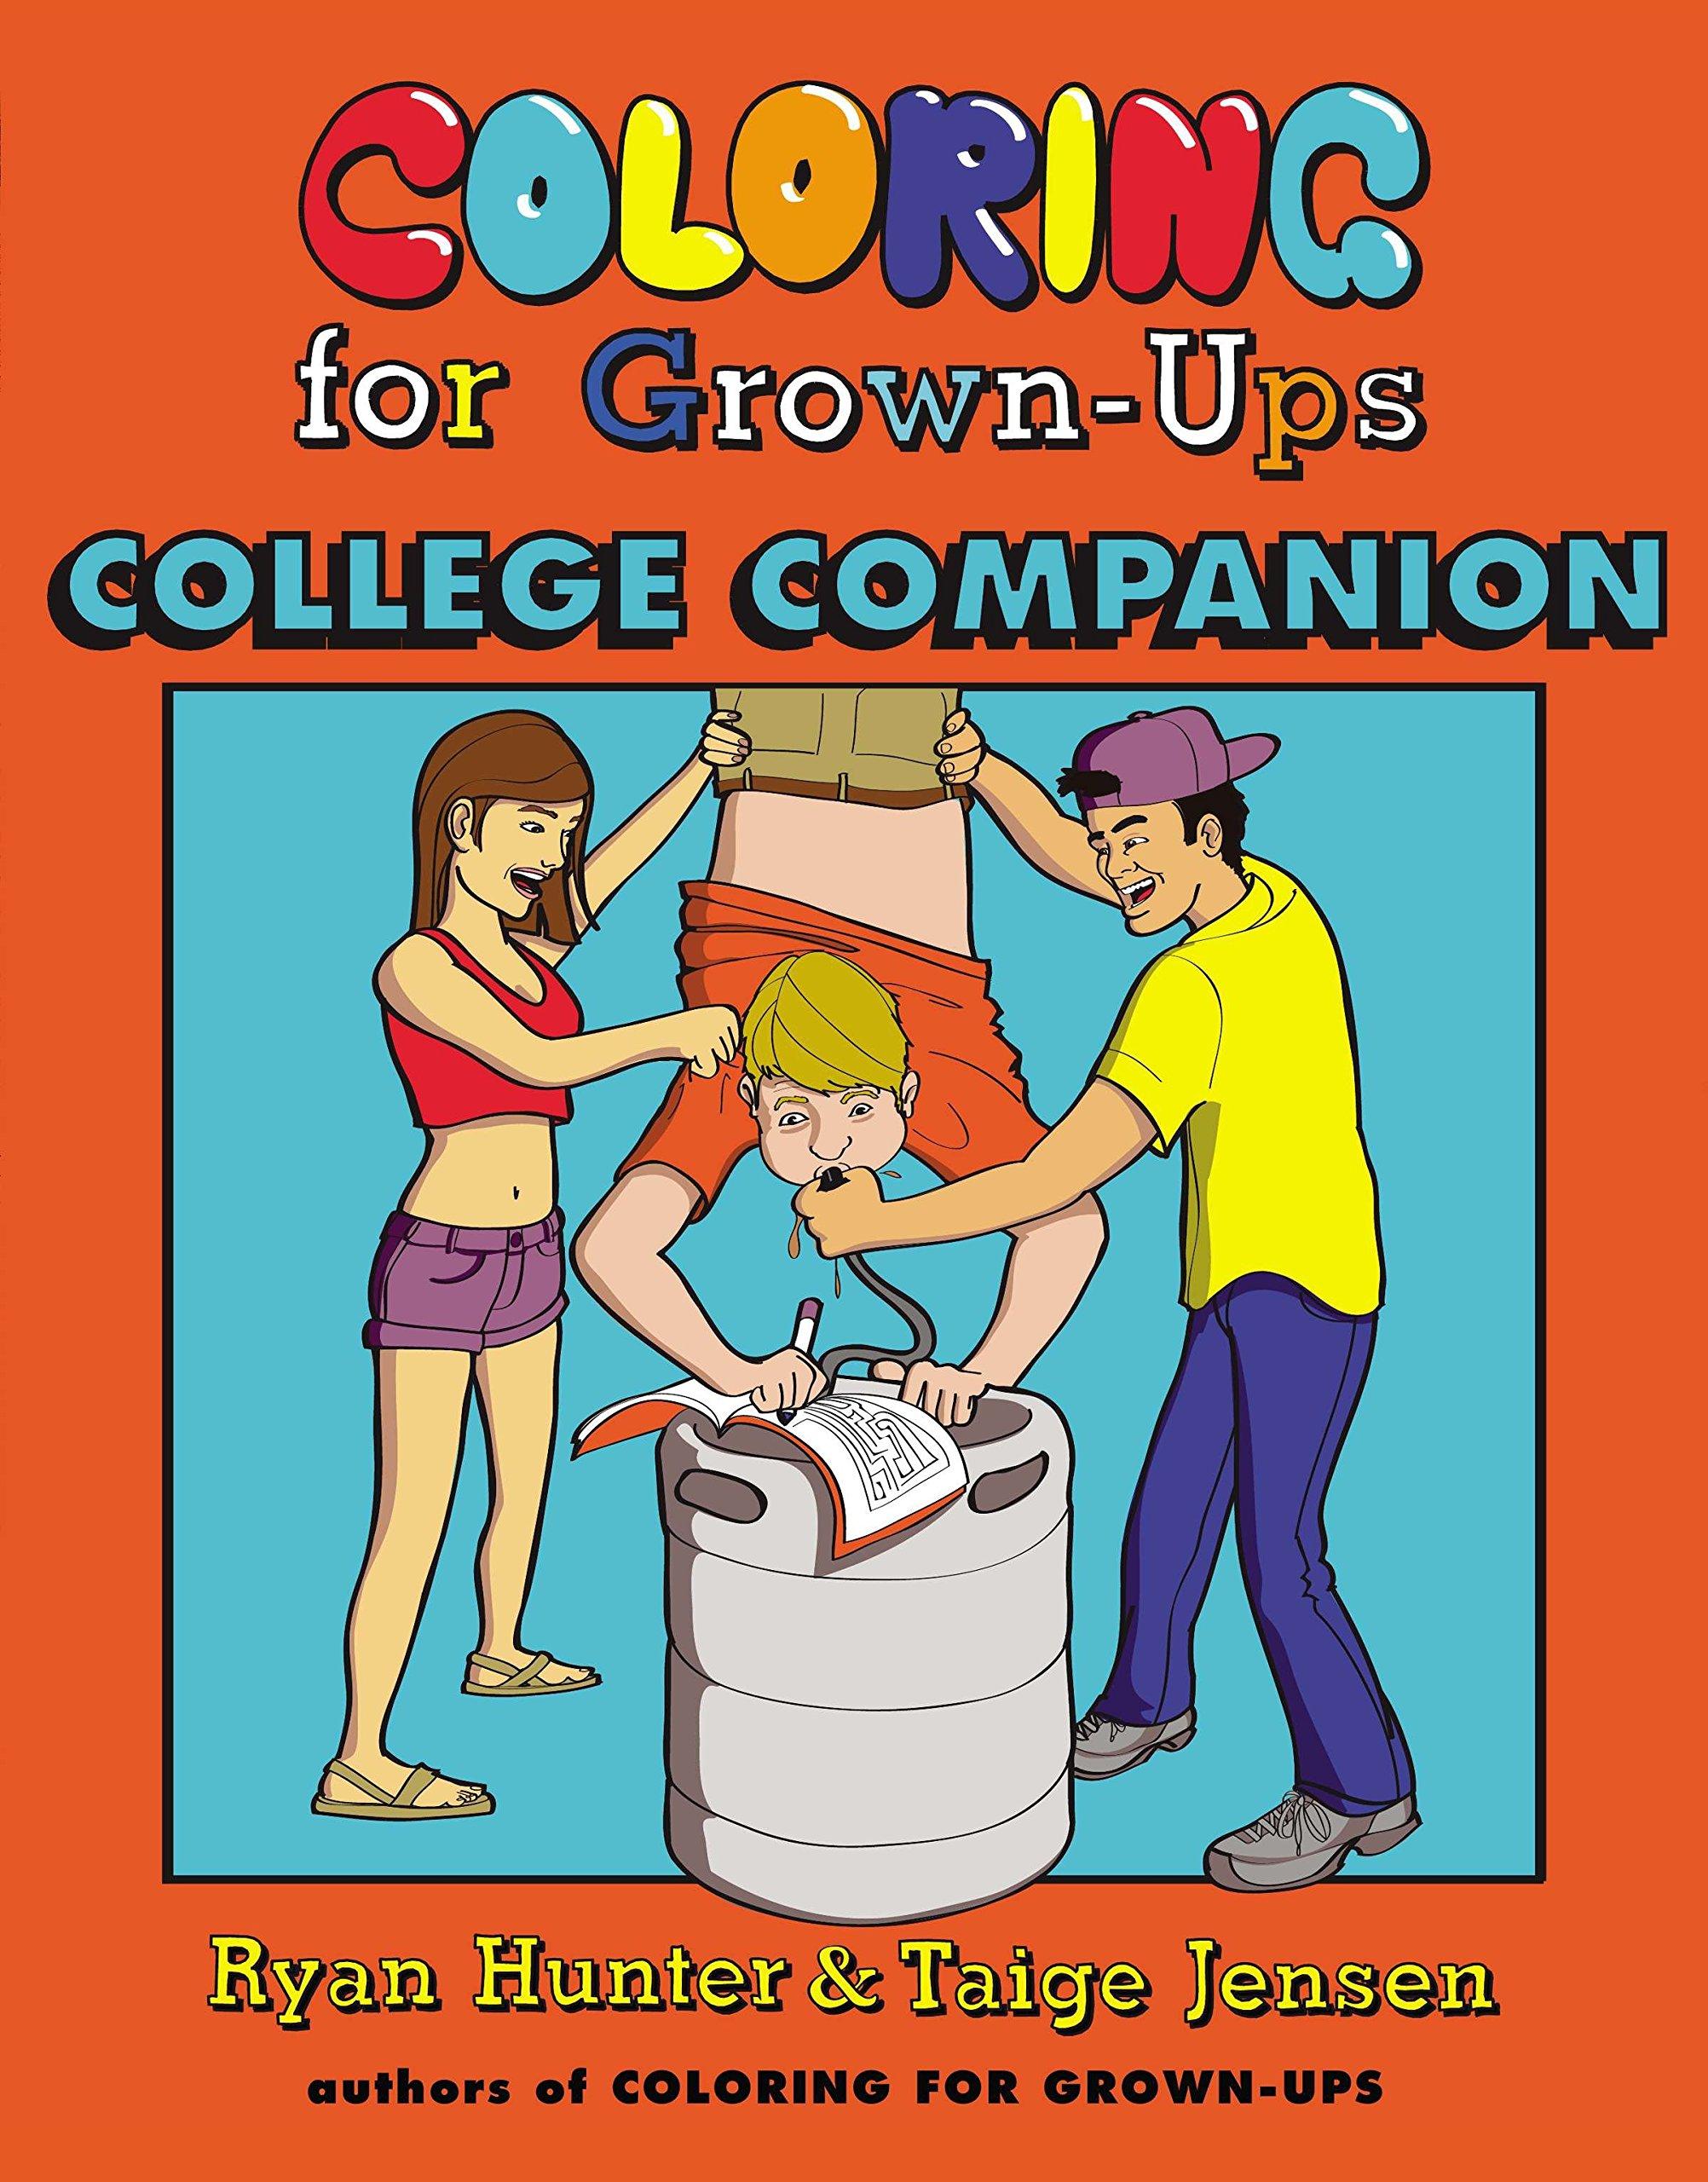 Amazon.com: Coloring for Grown-Ups College Companion (9780142181416 ...